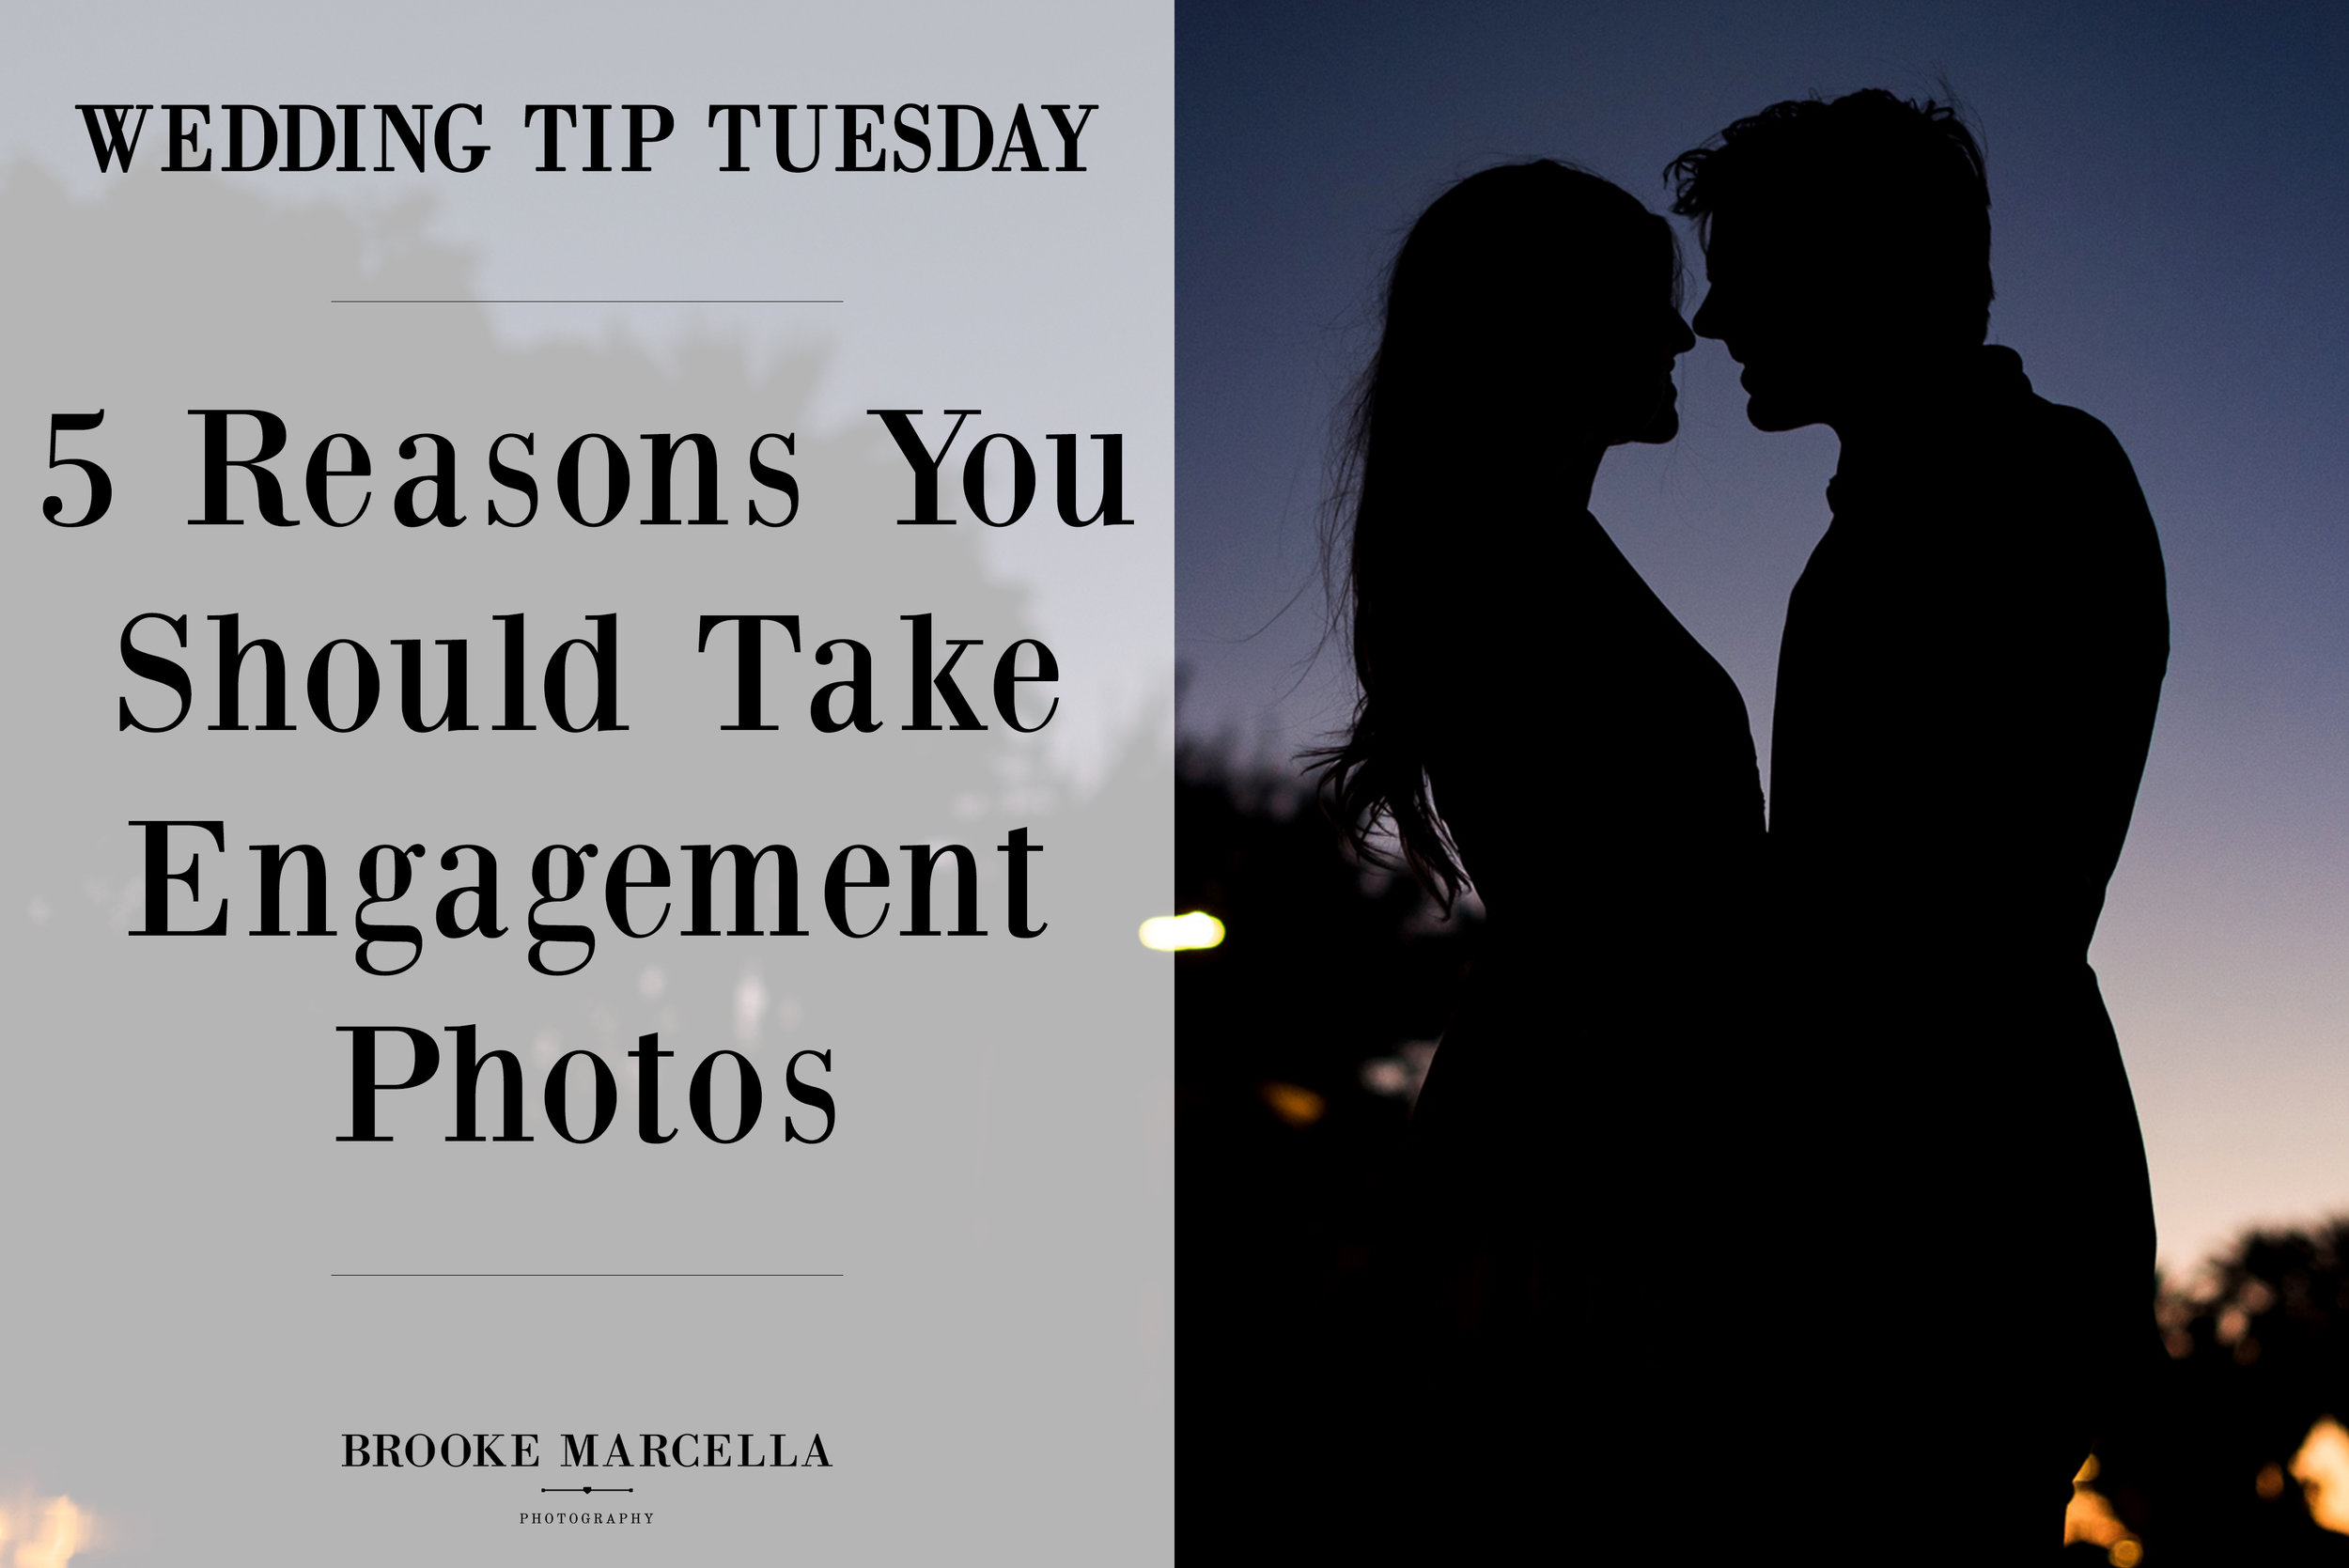 purposeofengagementphotos.jpg